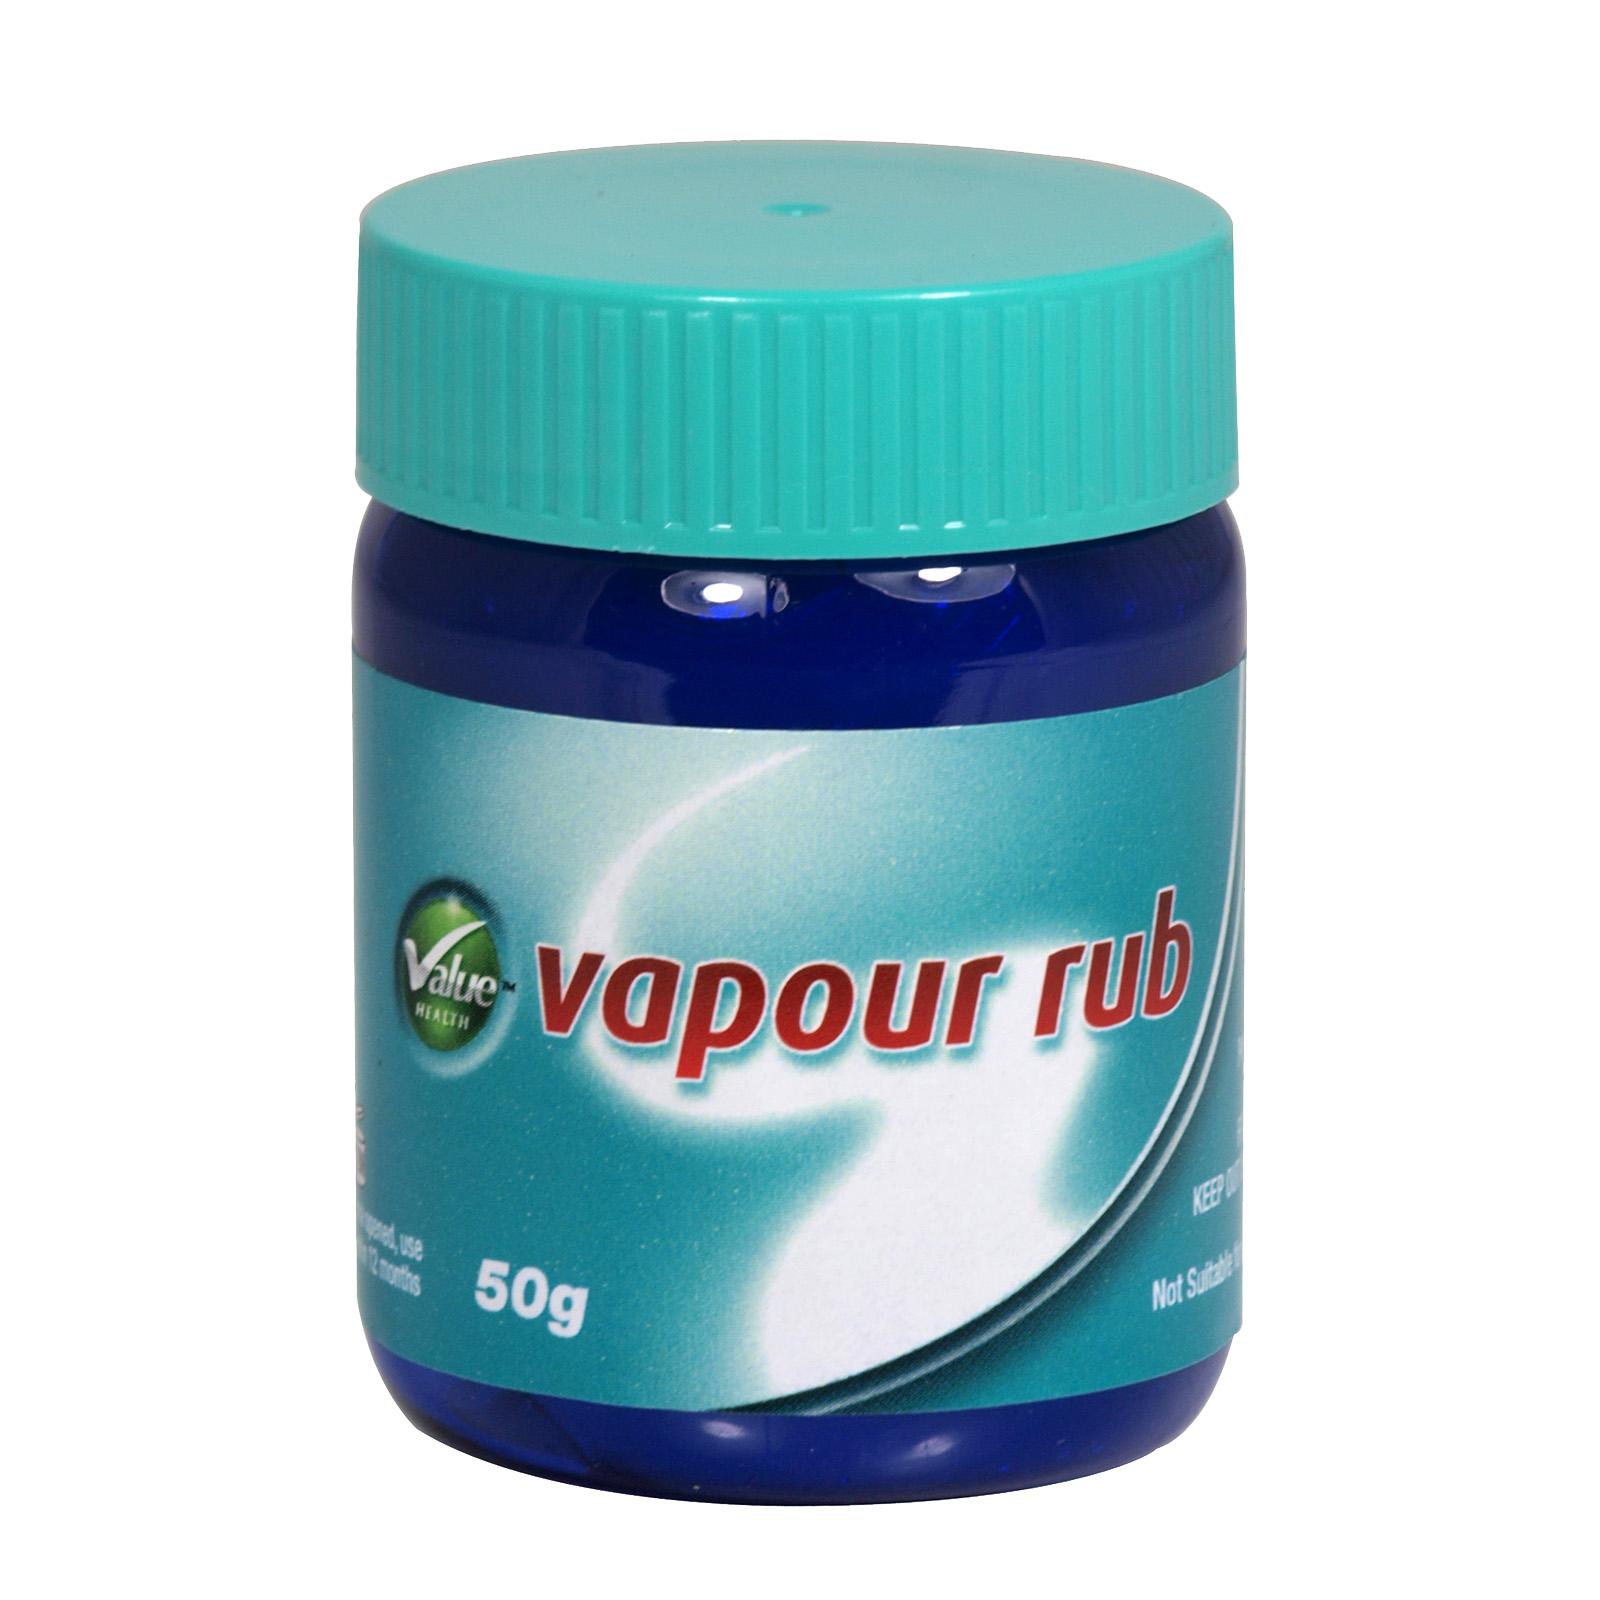 VALUE HEALTH VAPOUR RUB 50GM X3 (NON RETURNABLE)